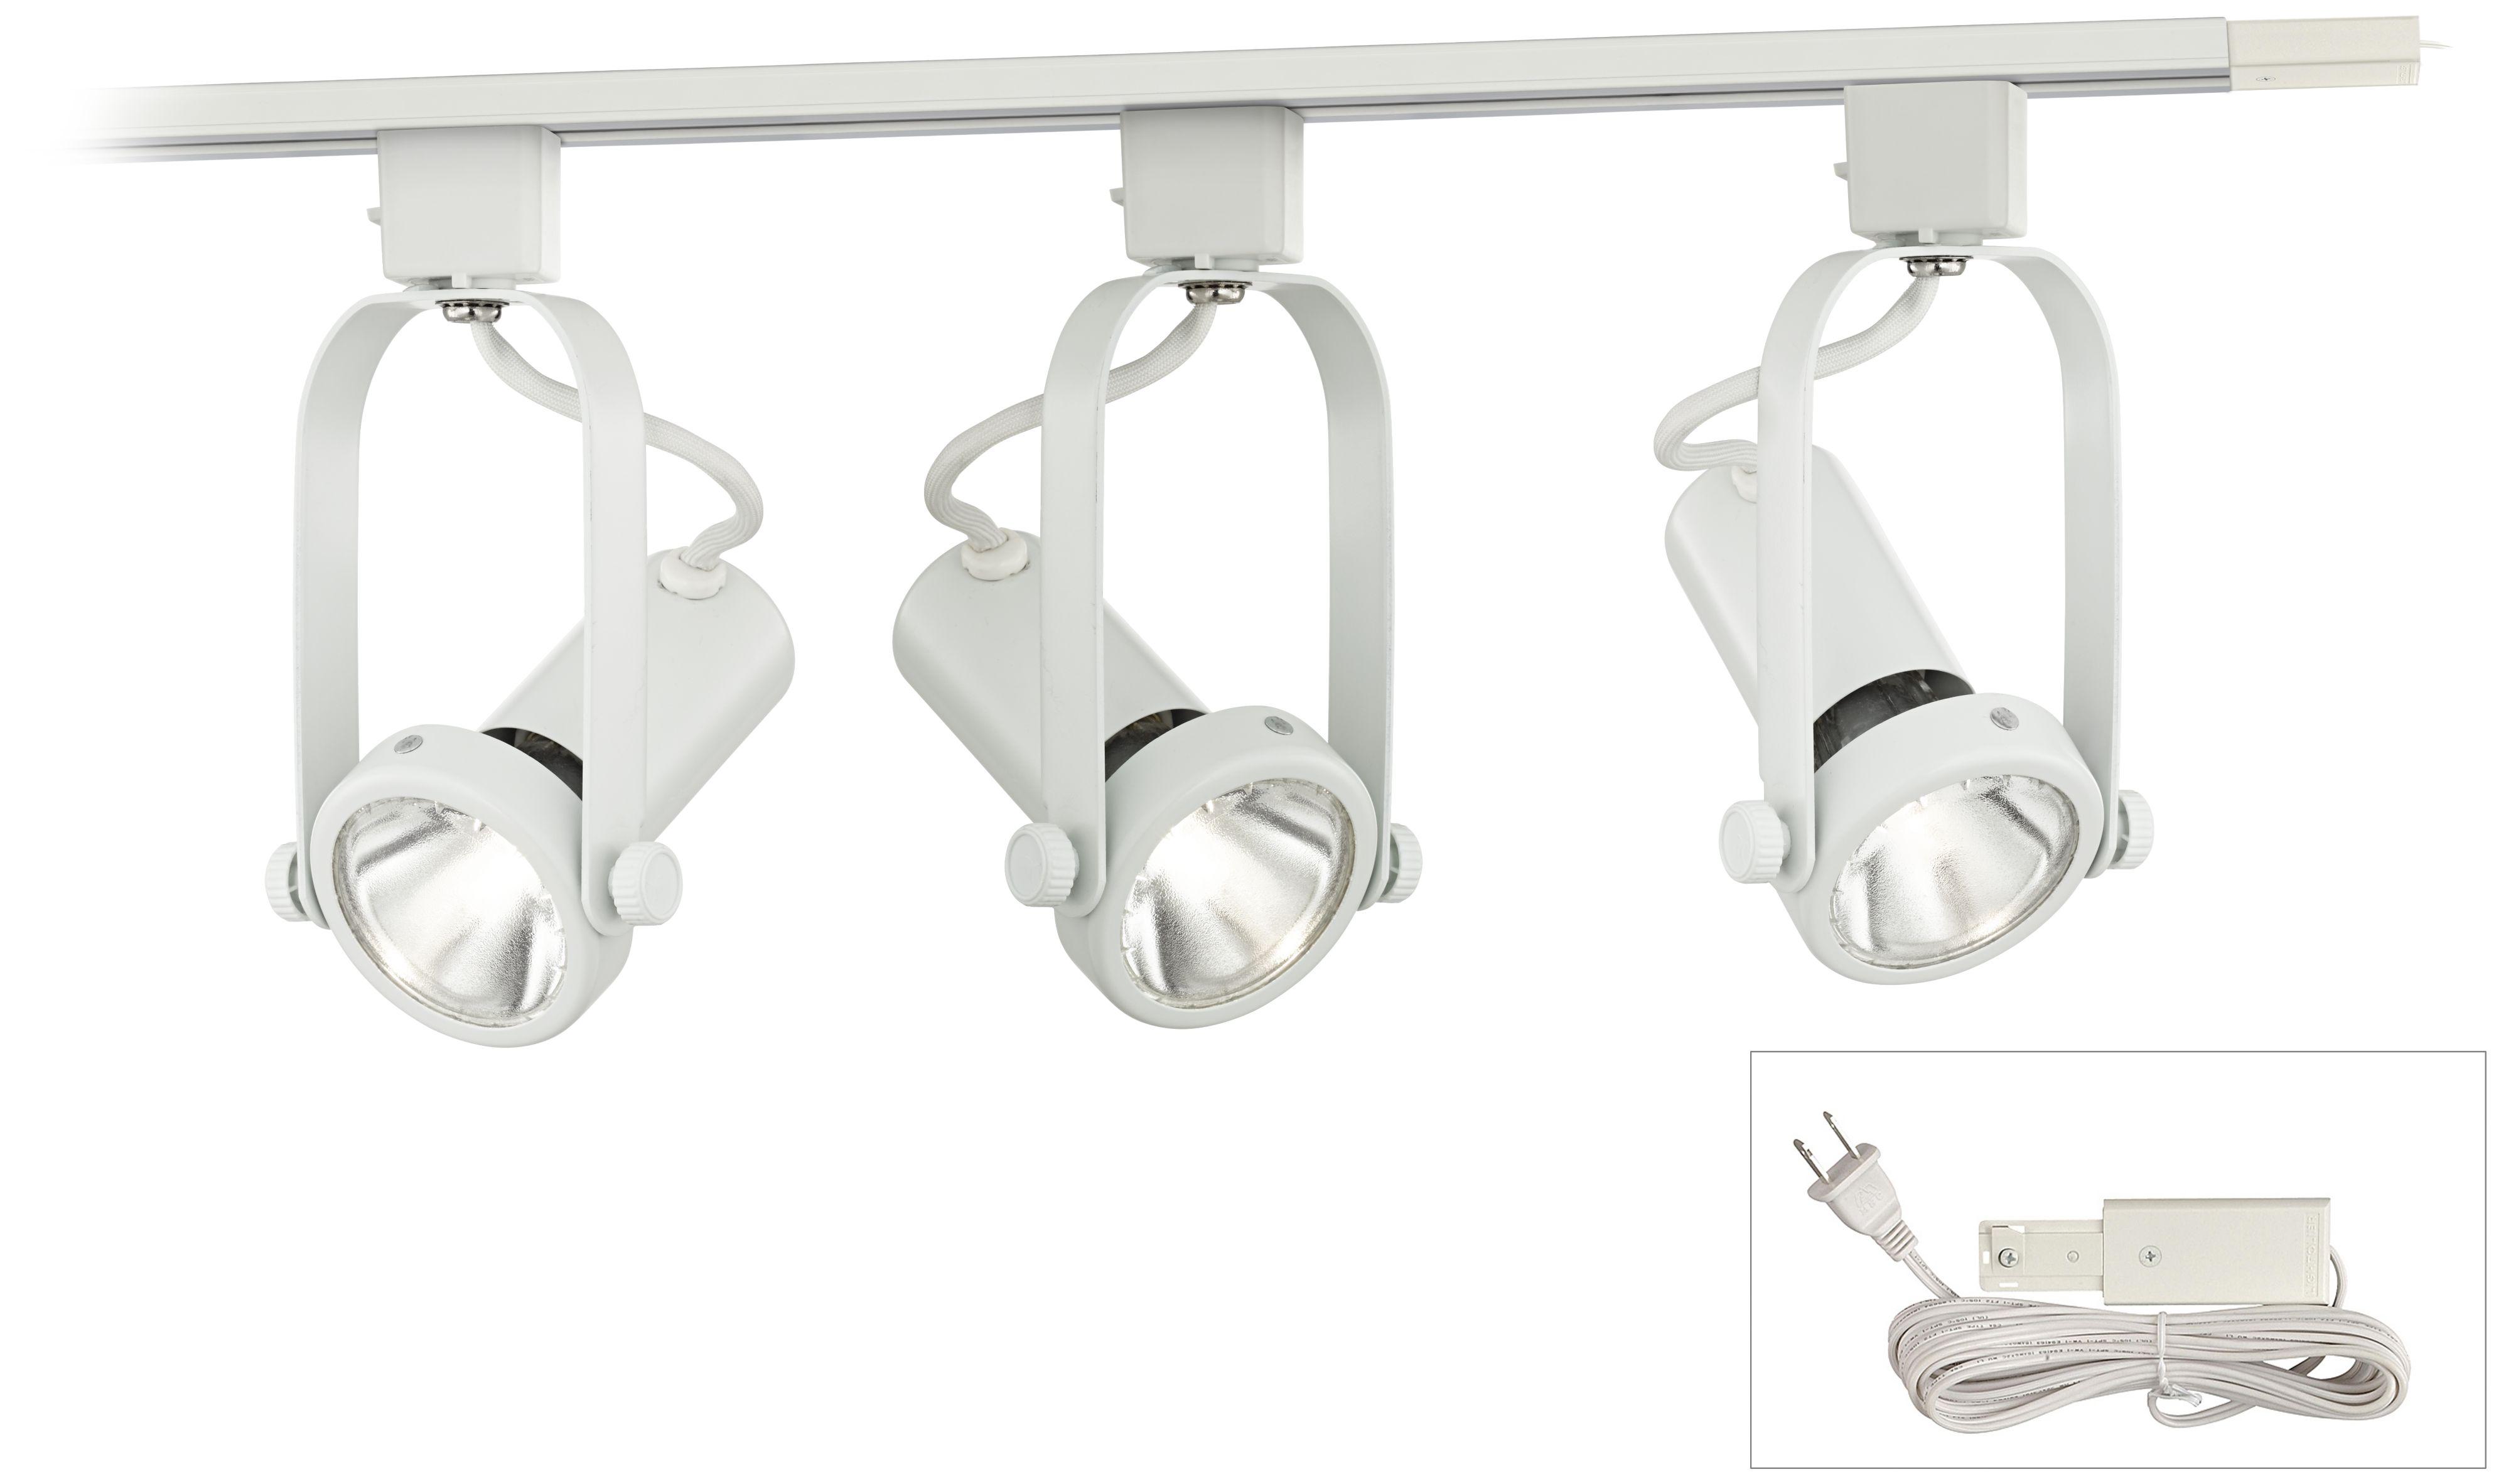 Lightolier Par Bulb 3-Light White Plug-In Linear Track Kit  sc 1 st  L&s Plus & 4 Foot Plug-In Track Lighting | Lamps Plus